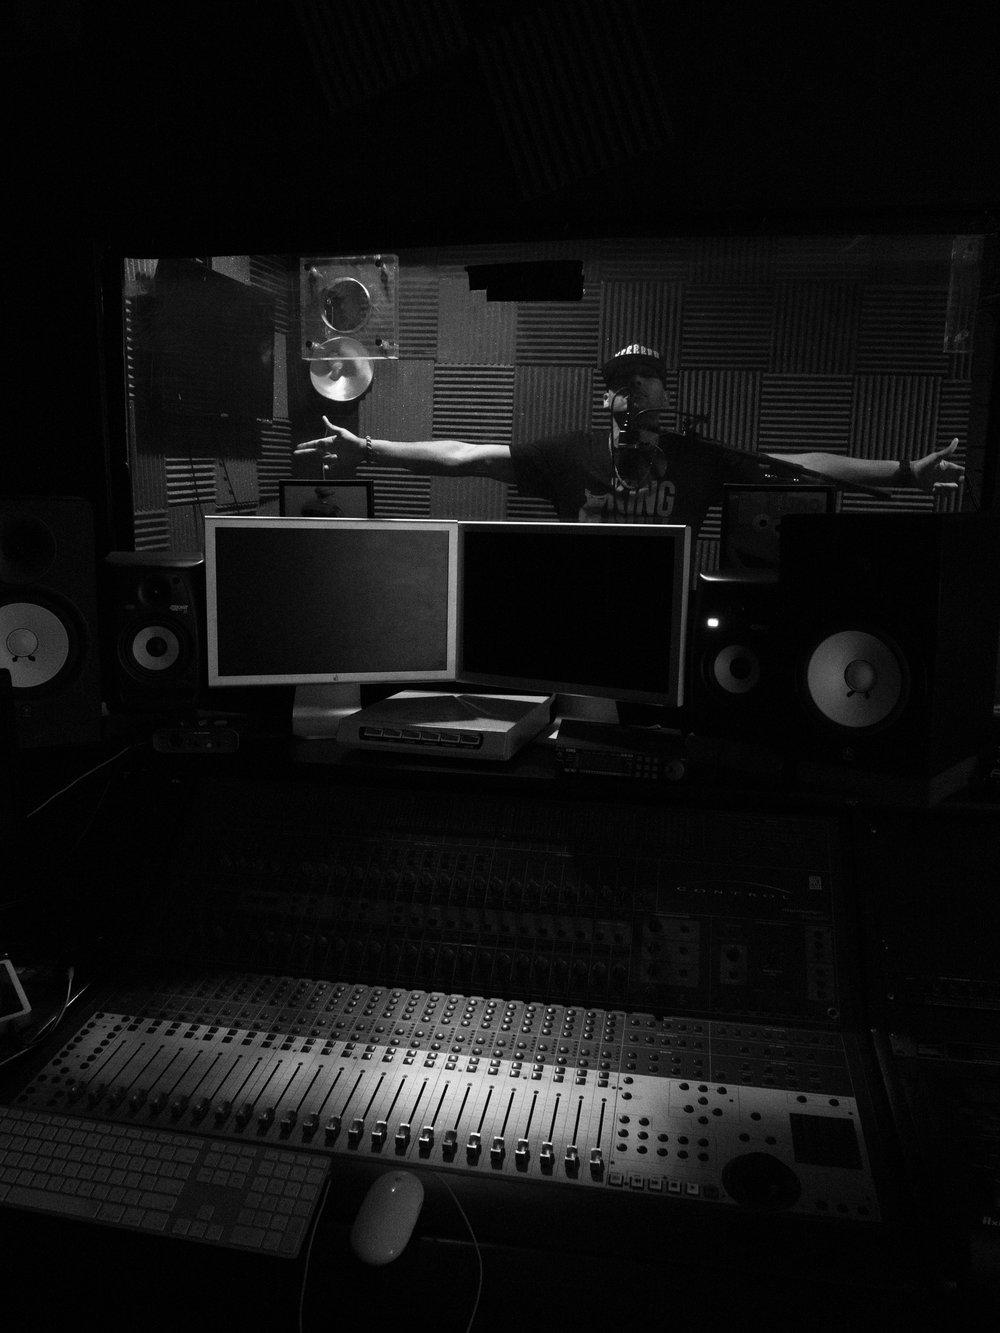 amiss in studio bw-2066240.jpg